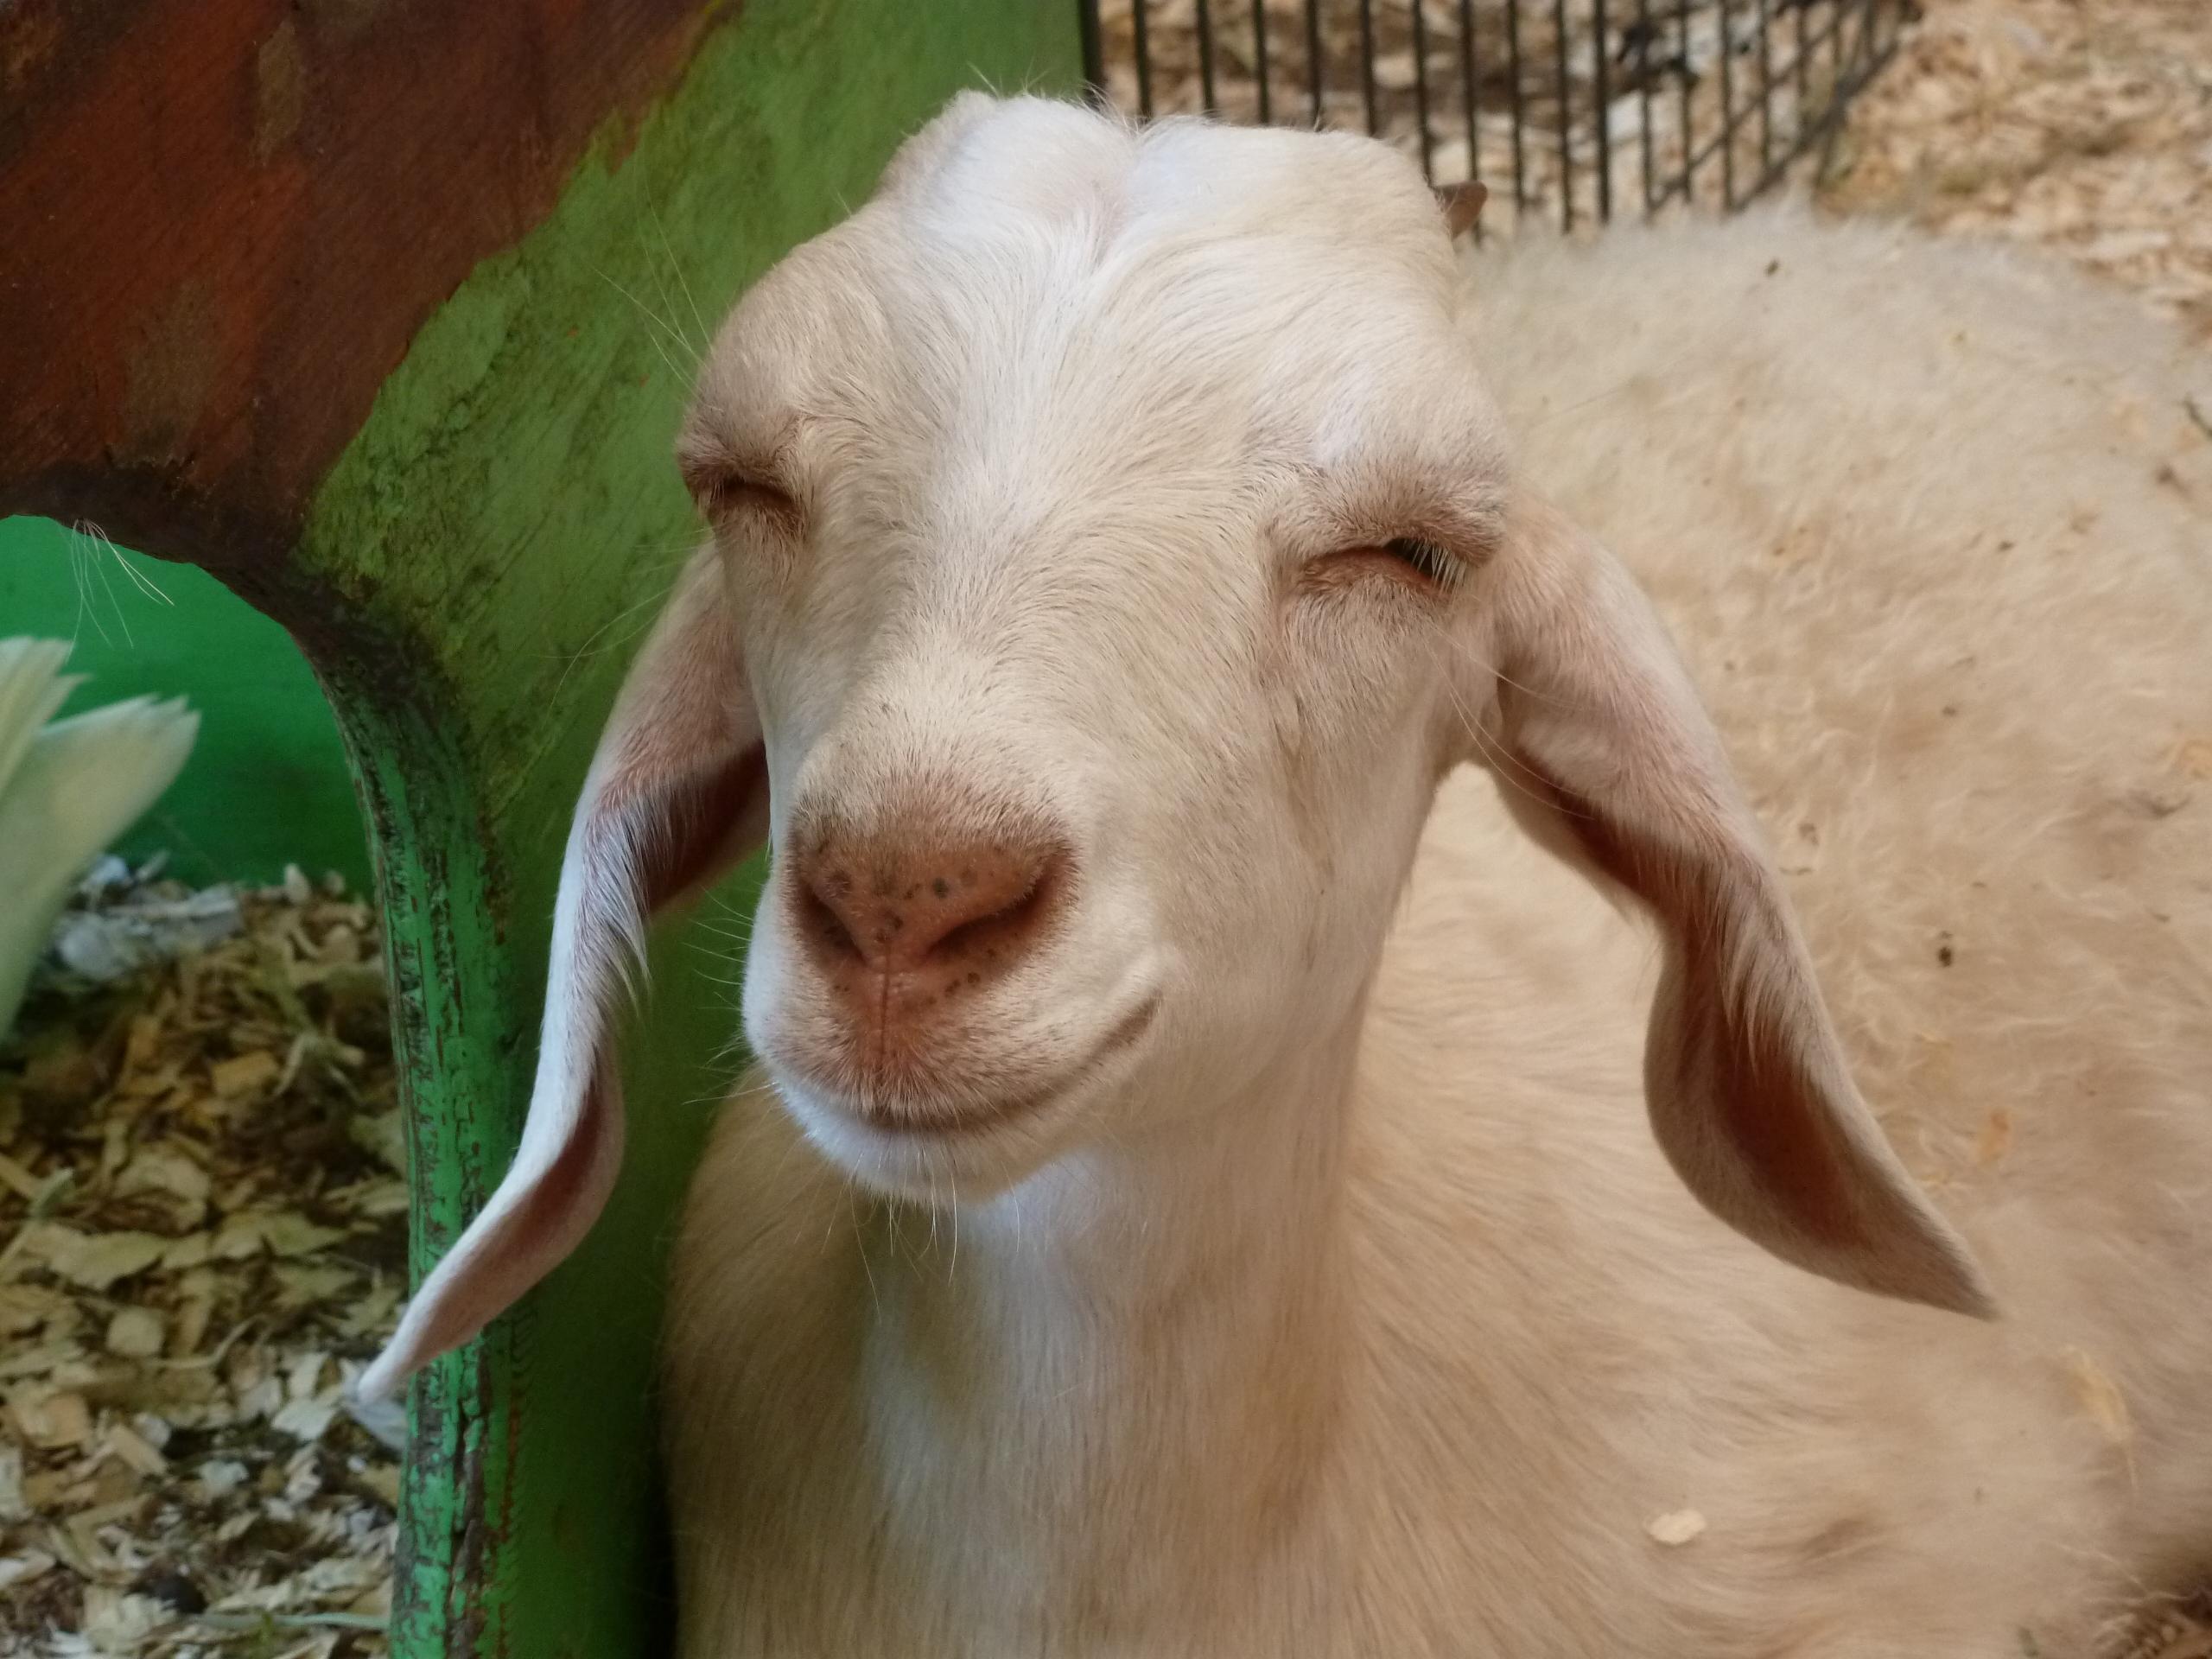 Goat 2 CNE